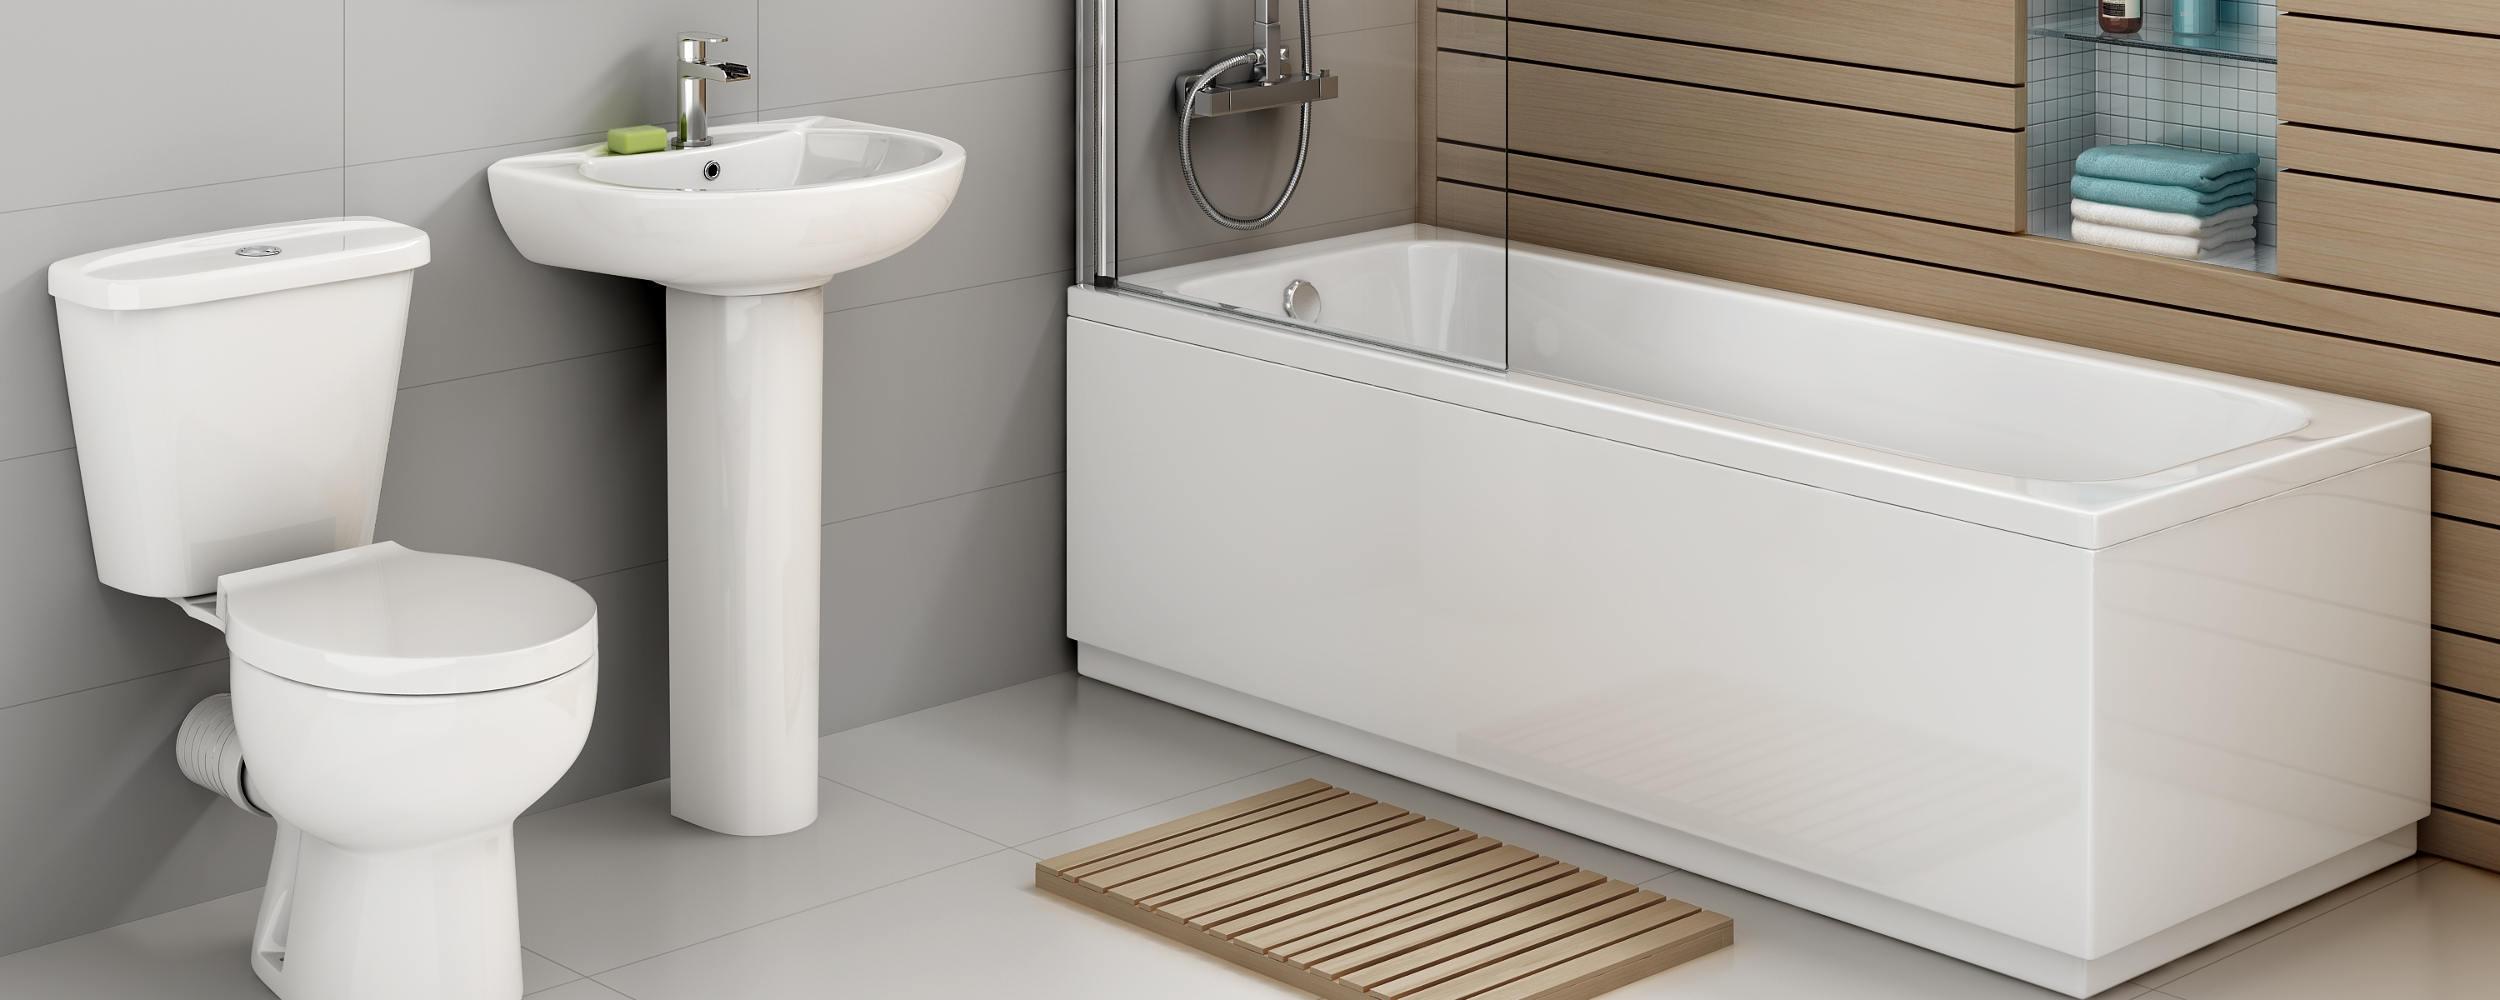 En-suite Bathroom Design Edinburgh | Ensuite Bathrooms Edinburgh ...